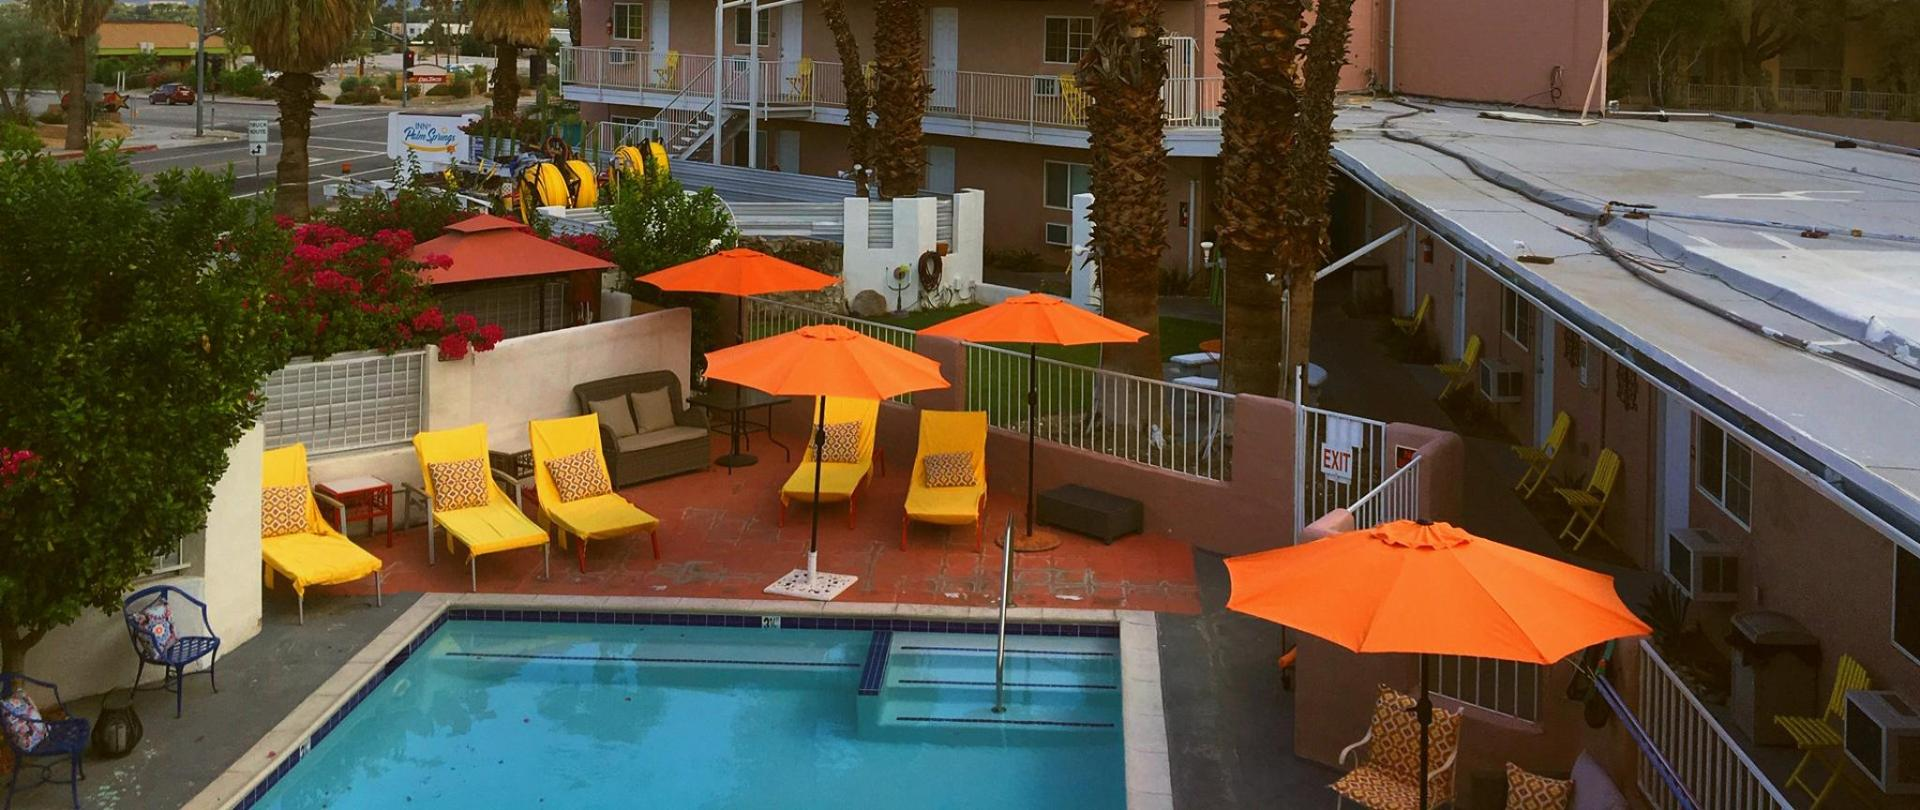 Pool area with bright umbrellas-rev.jpg